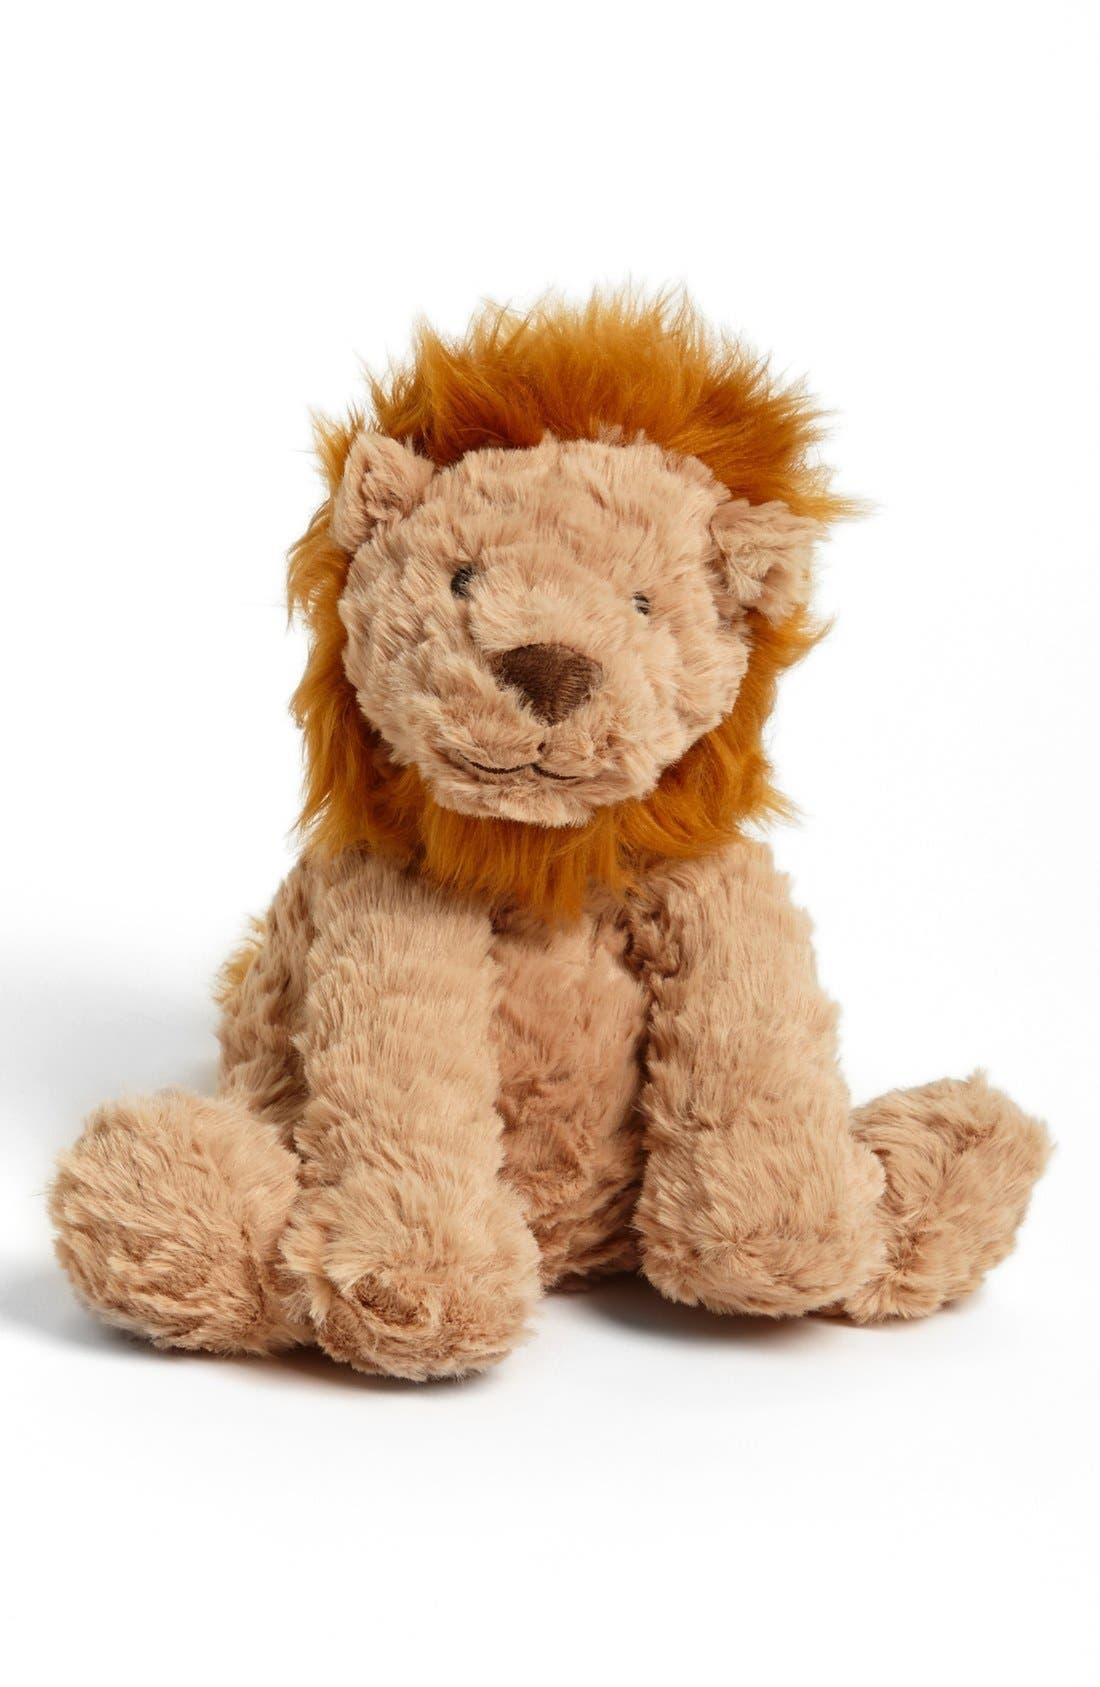 Jellycat Fuddlewuddle Lion Stuffed Animal Nordstrom